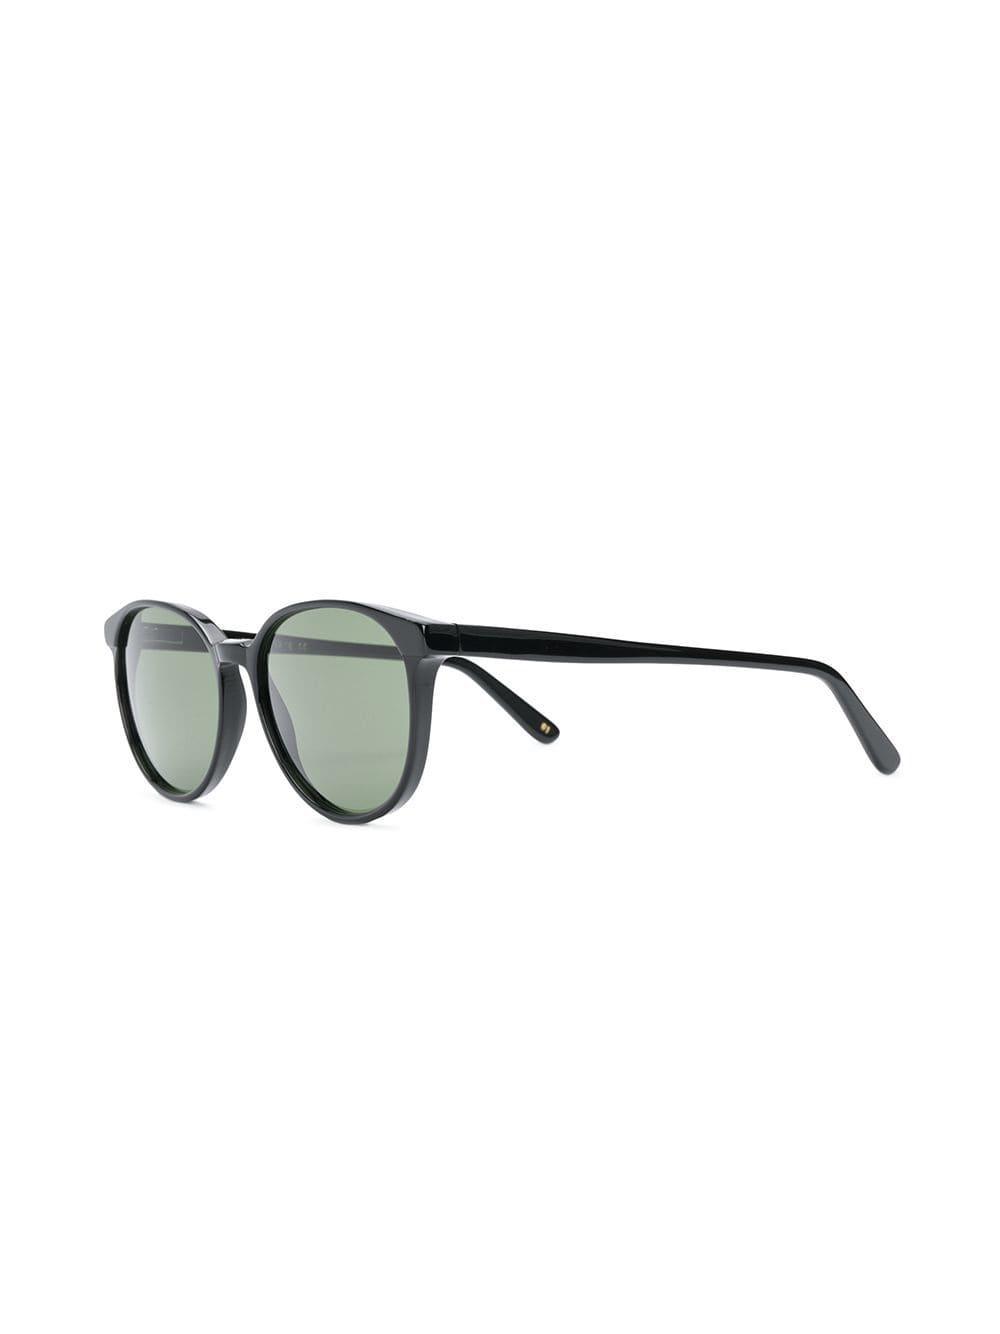 675b2d3bf2 Lgr - Black Keren Sunglasses - Lyst. View fullscreen